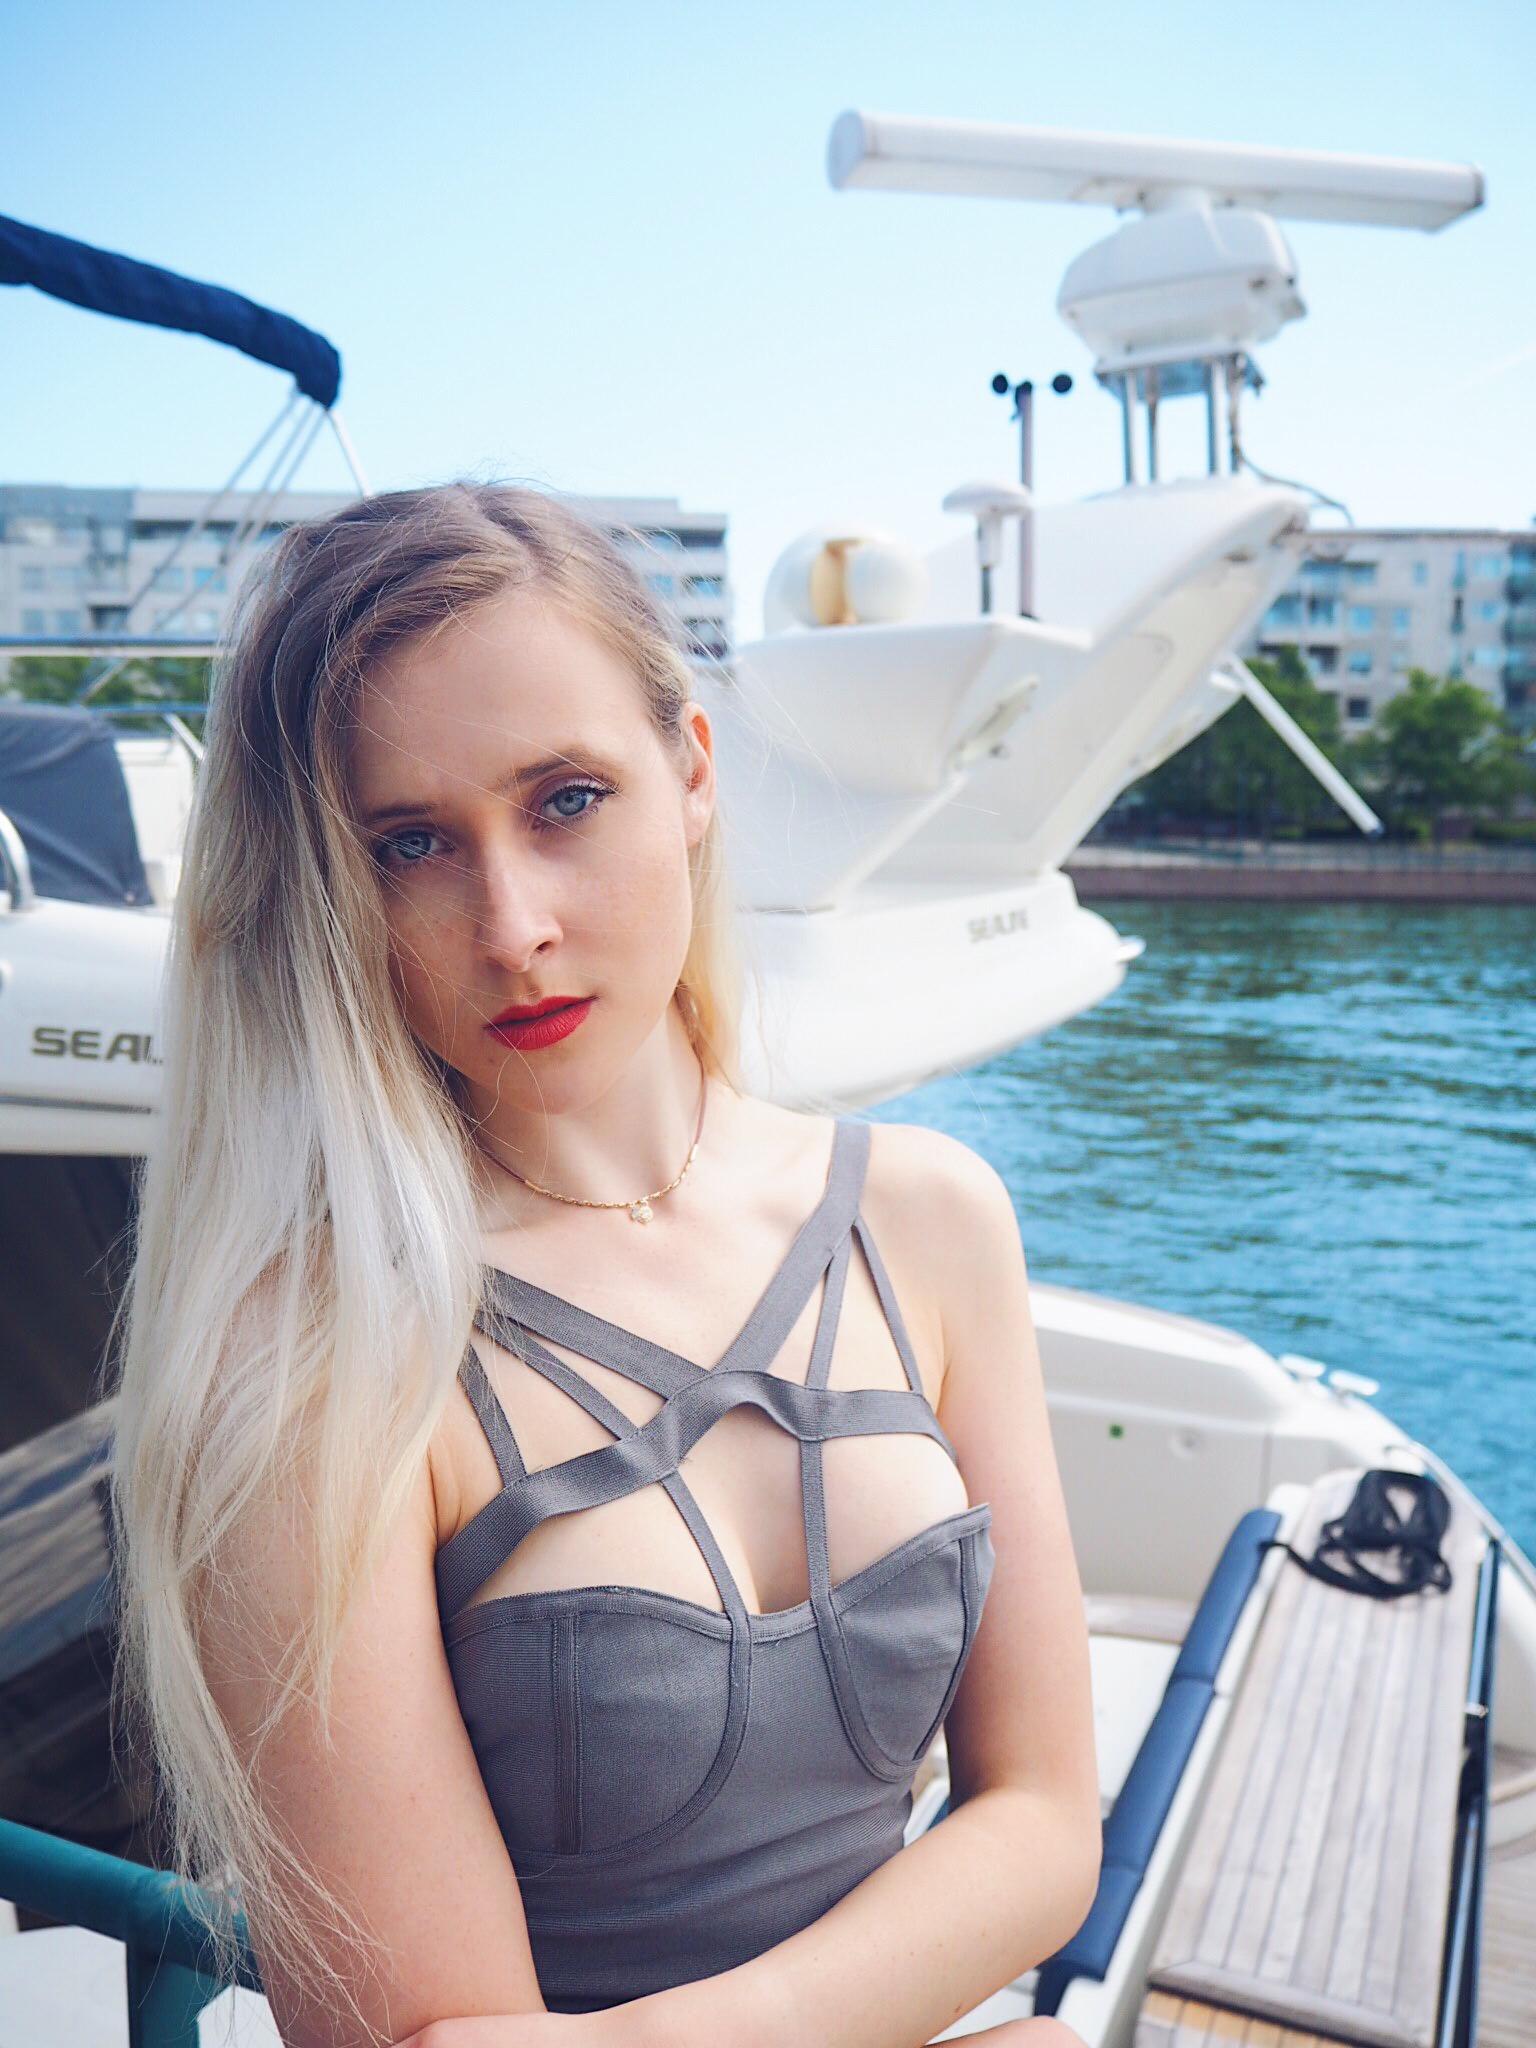 yachtmodel-4.jpg